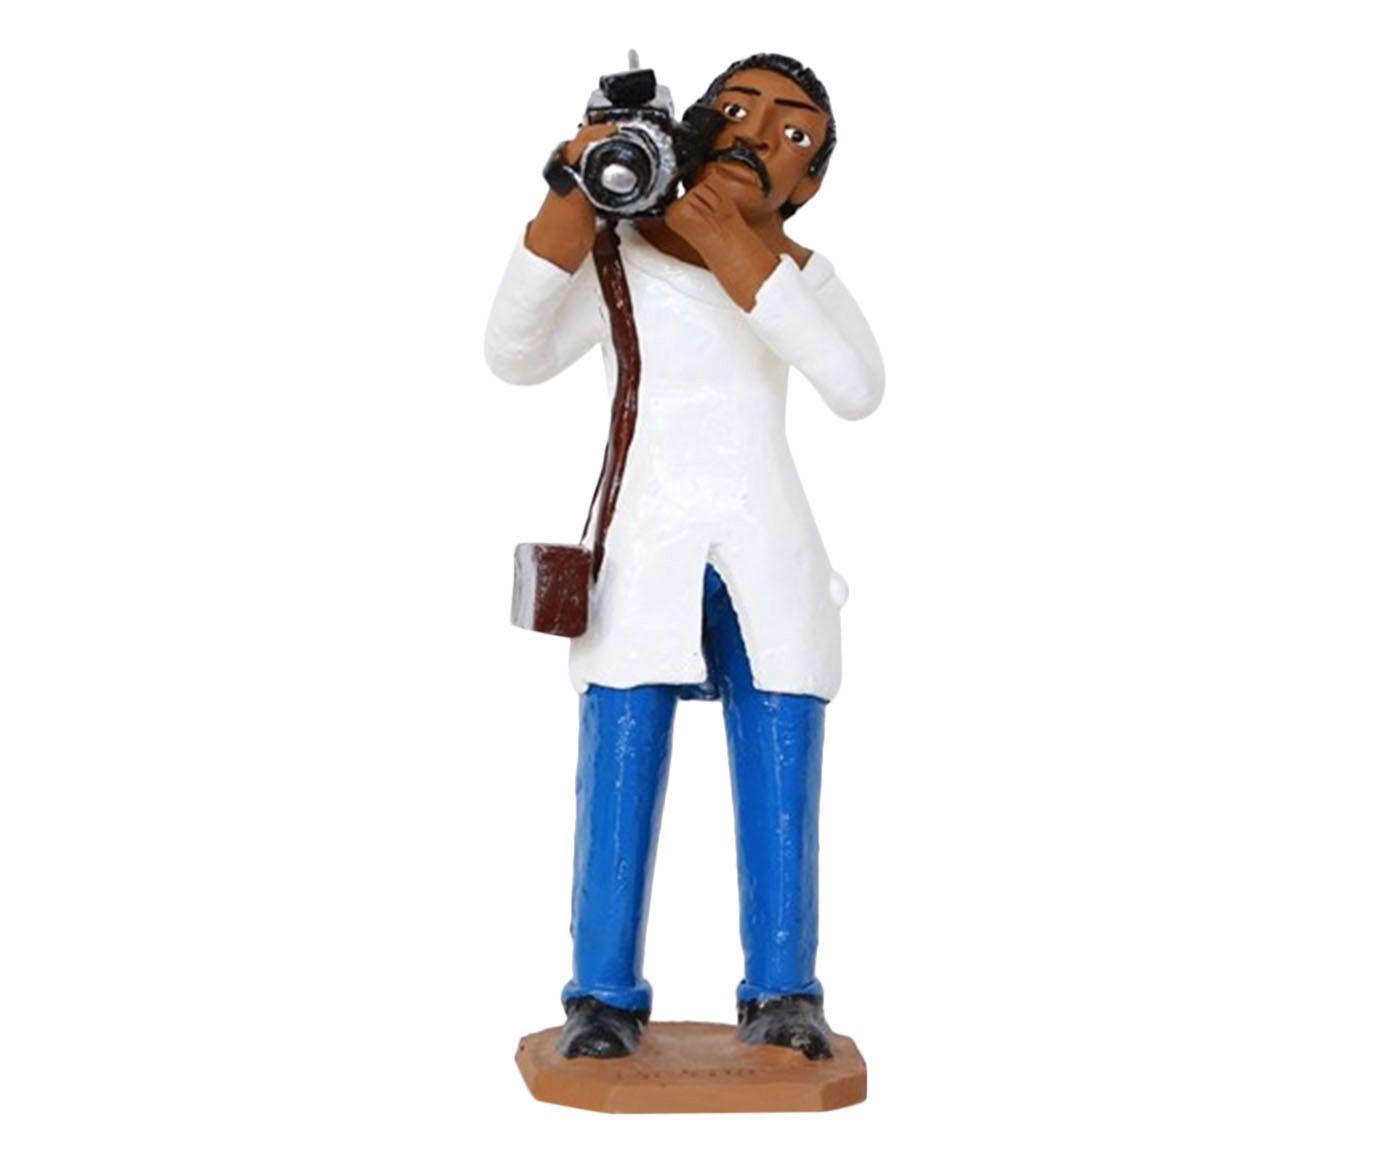 Escultura Fotógrafo Iii - 12X30X10cm | Westwing.com.br